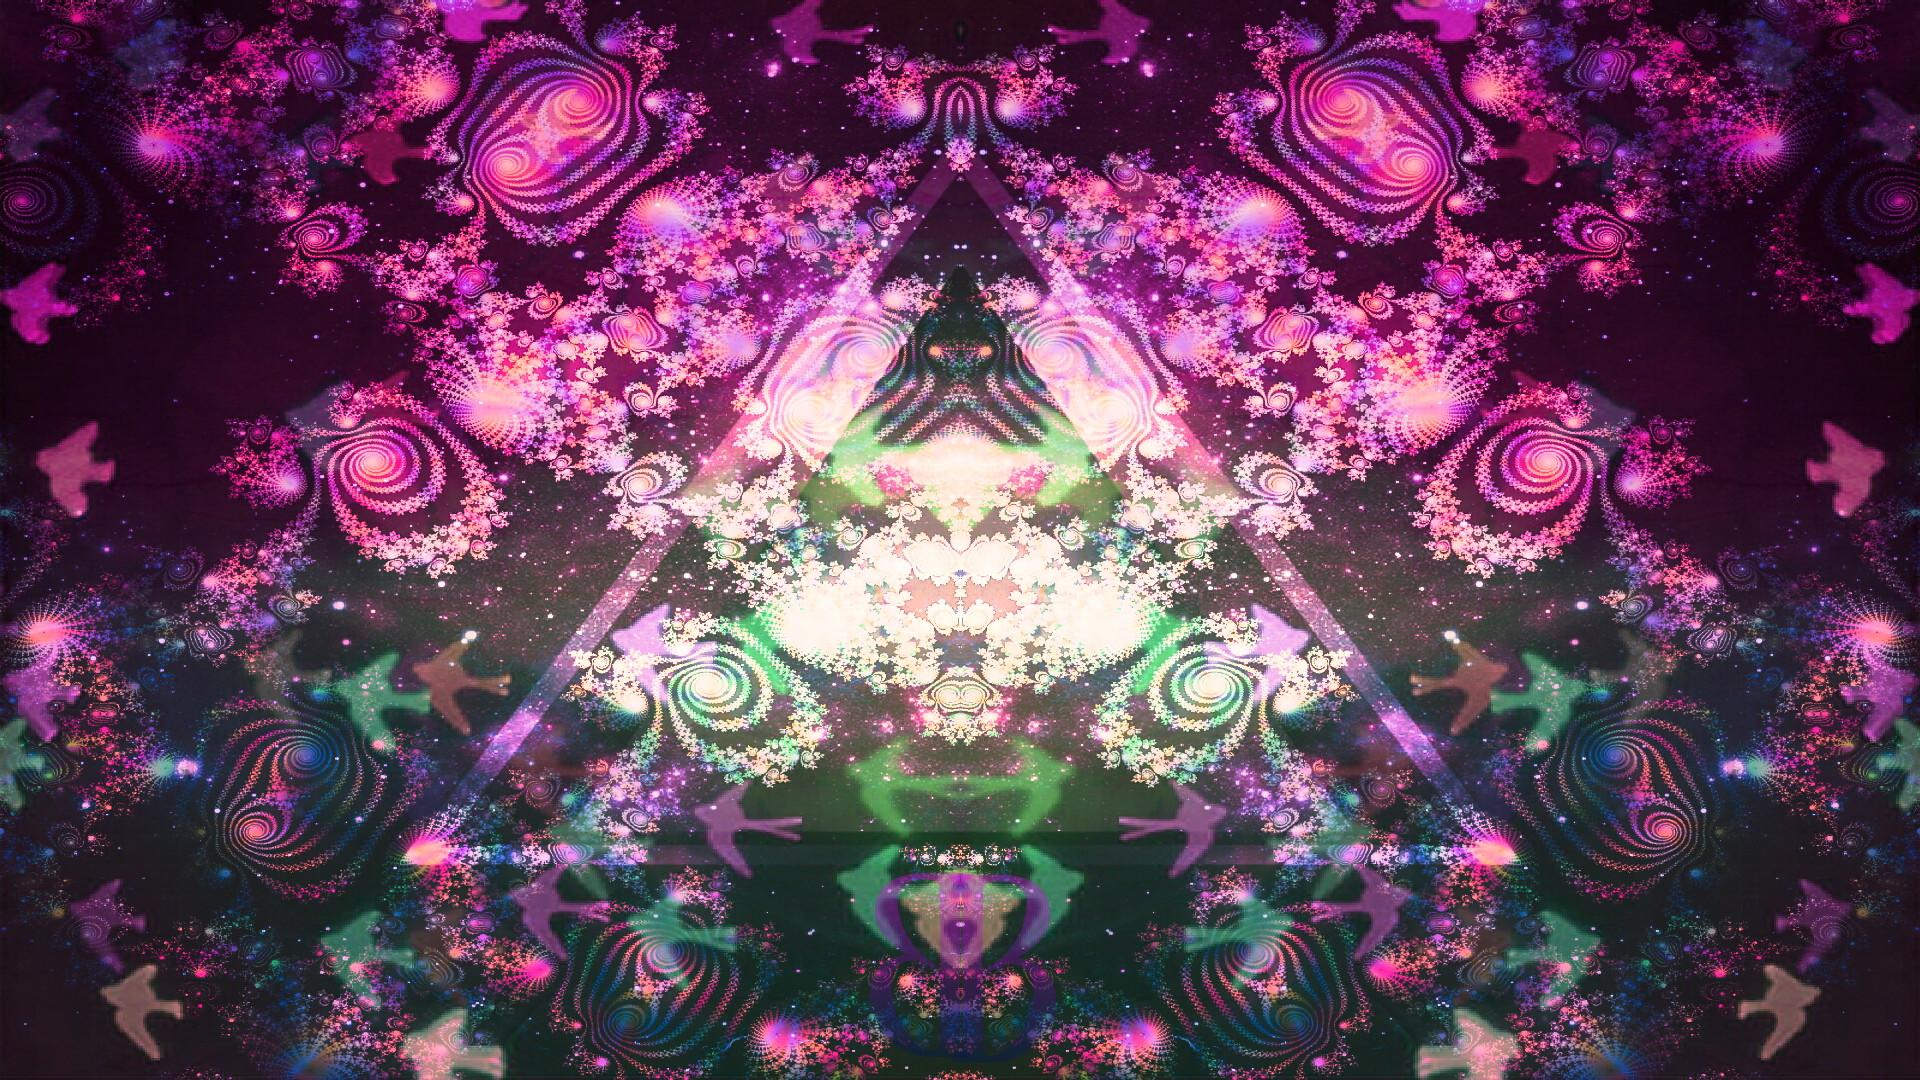 trippy galaxy wallpaper - photo #20